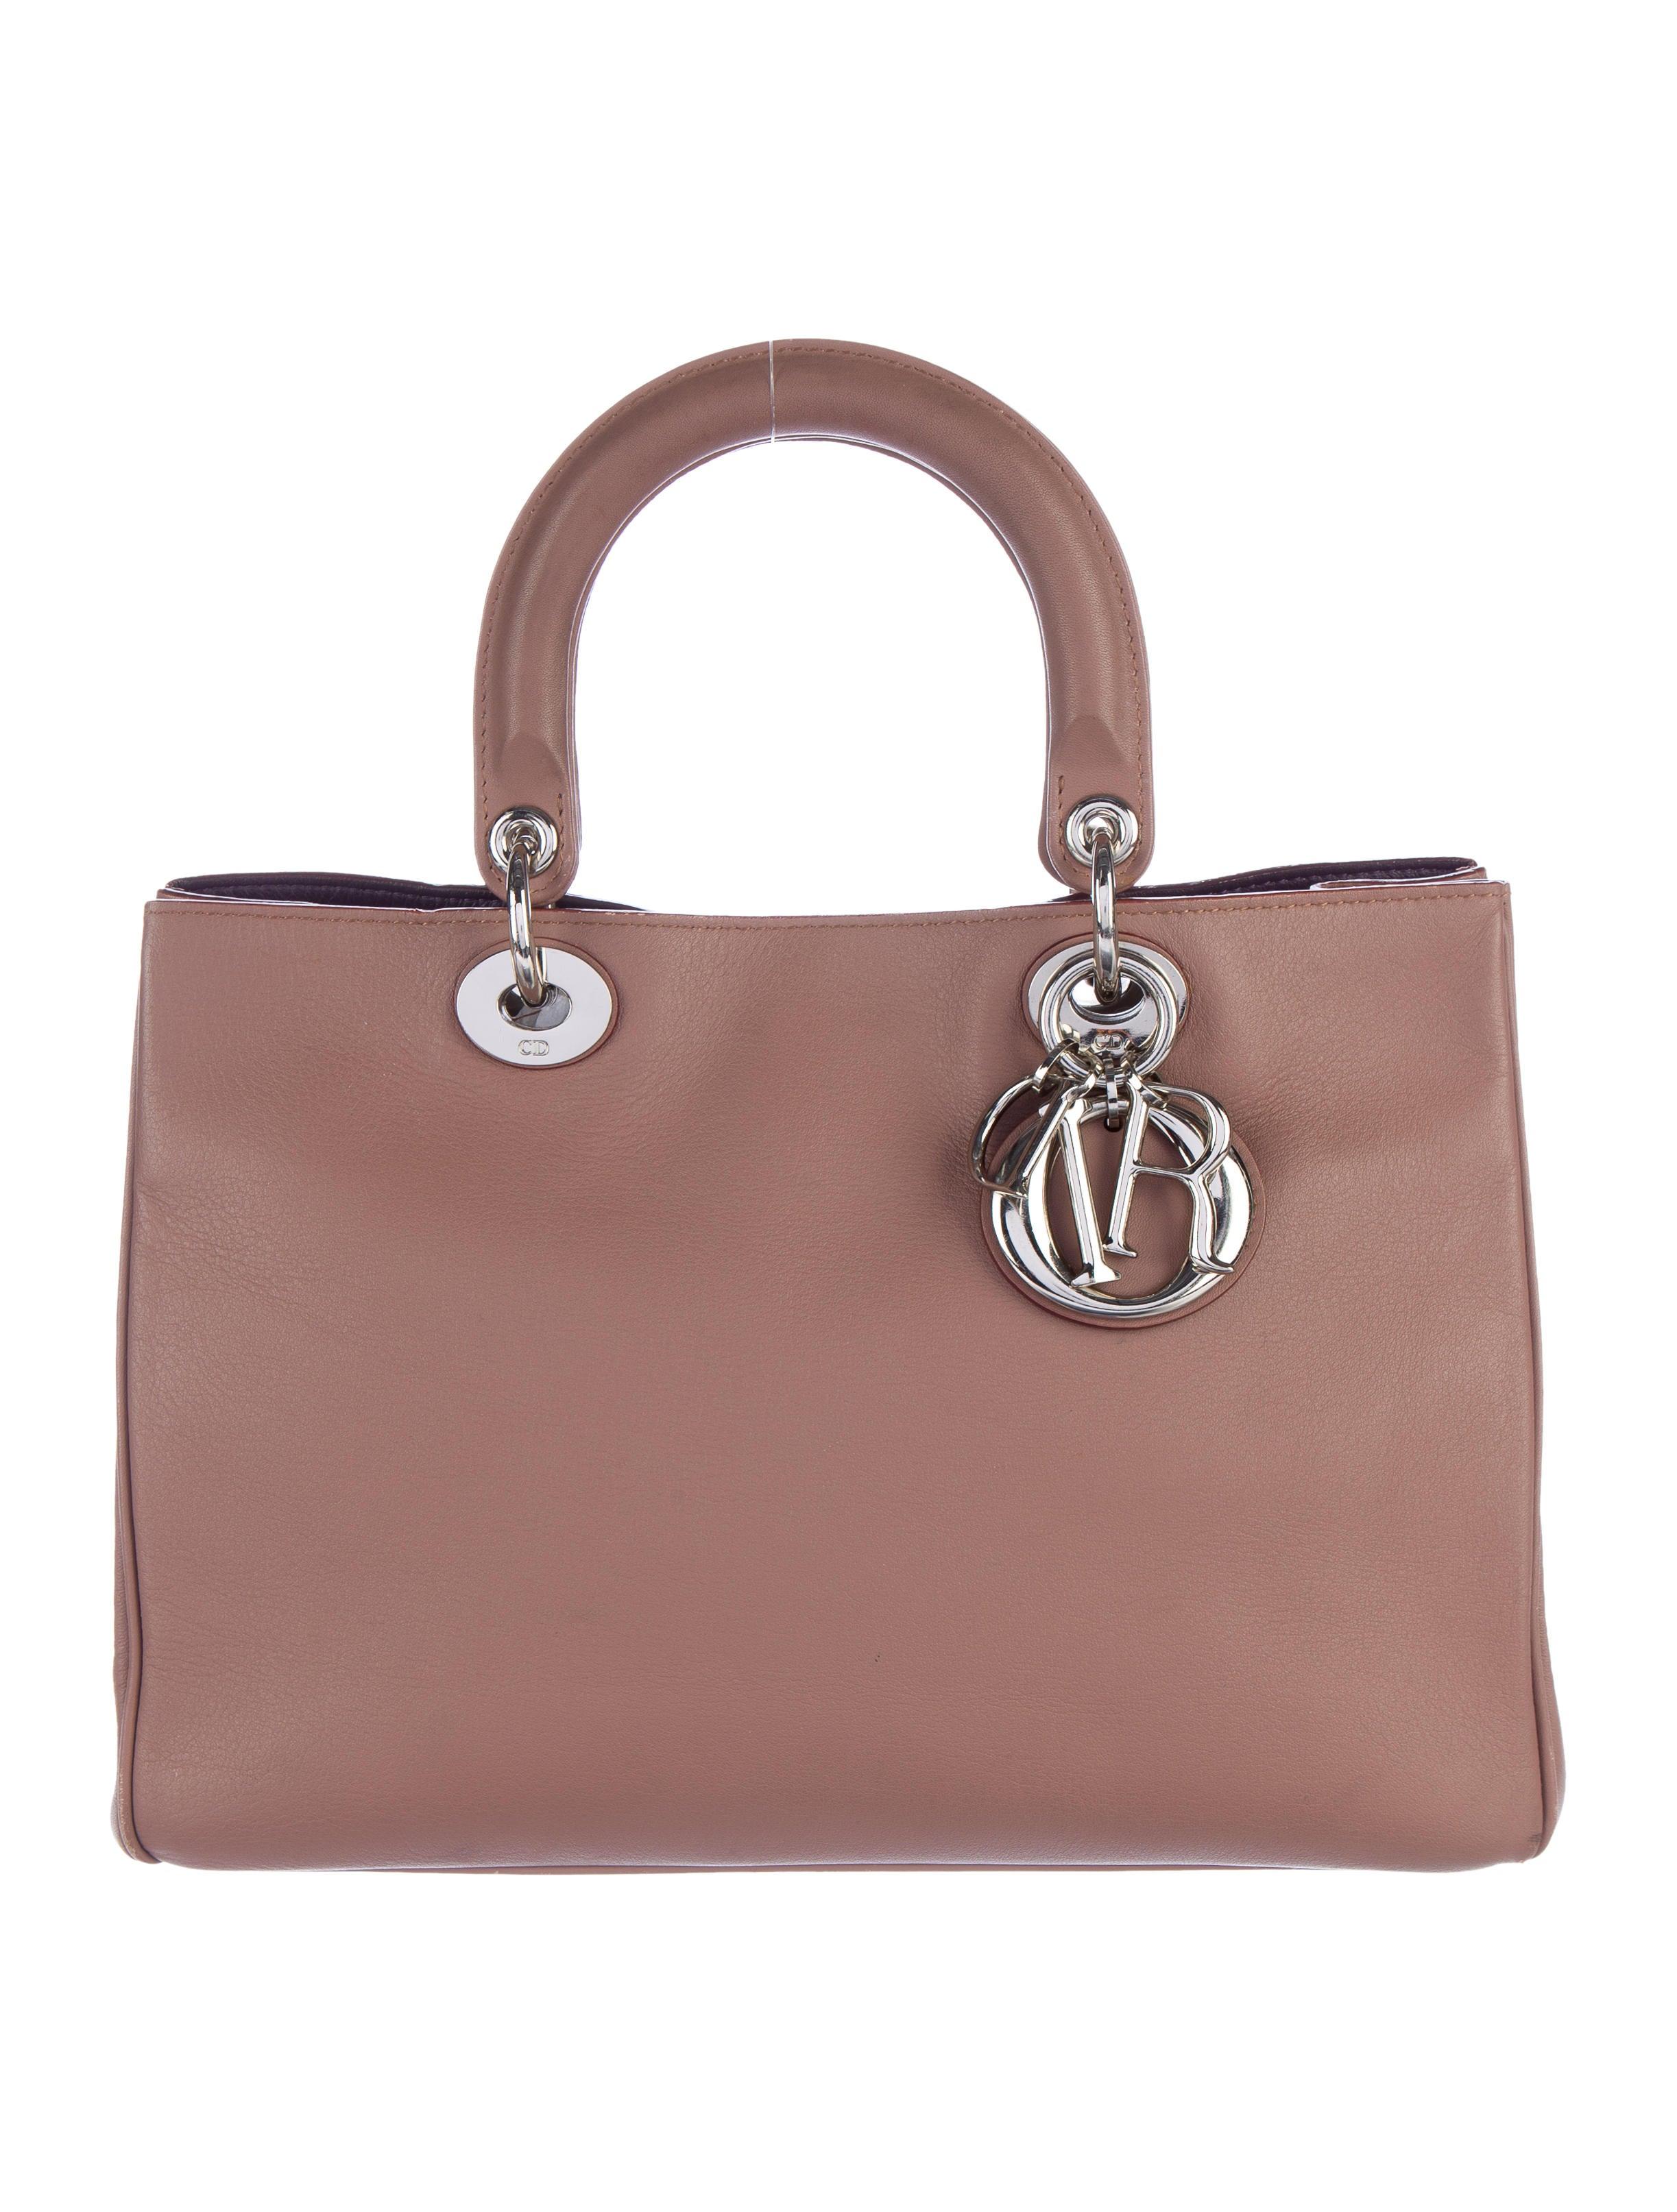 Padded Walls Christian Dior Medium Diorissimo Bag Handbags Chr49861